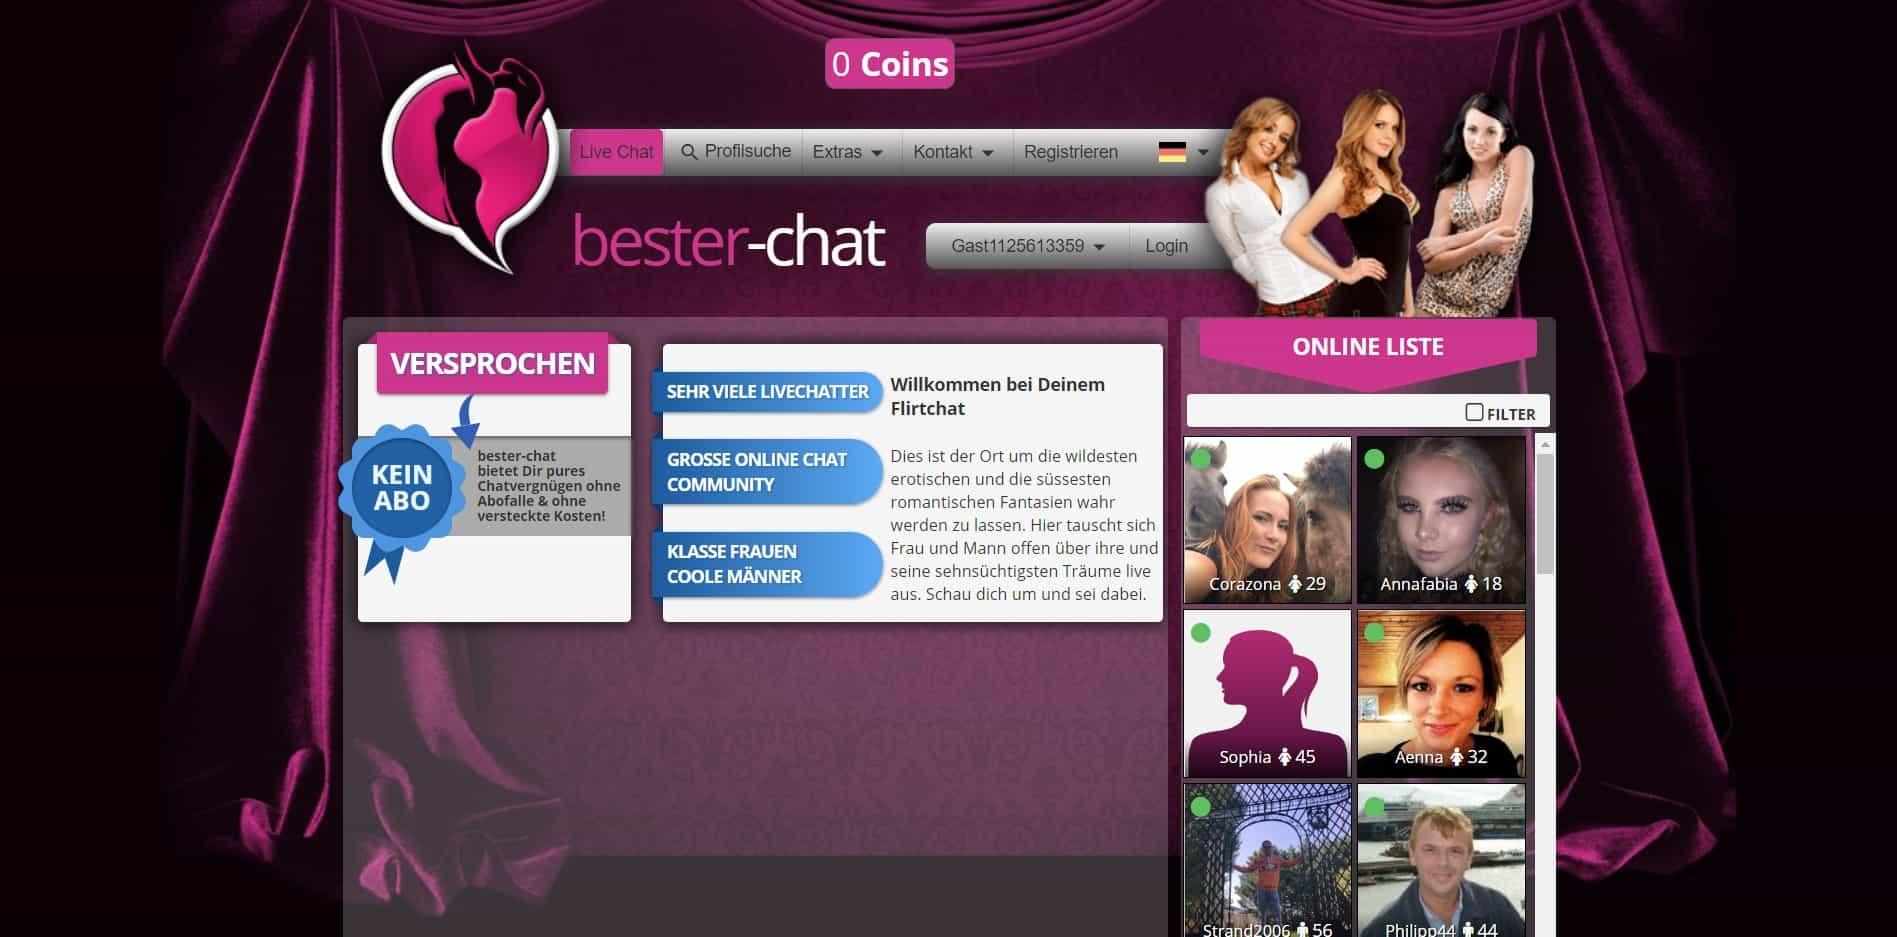 Testbericht: Bester-Chat.com Abzocke